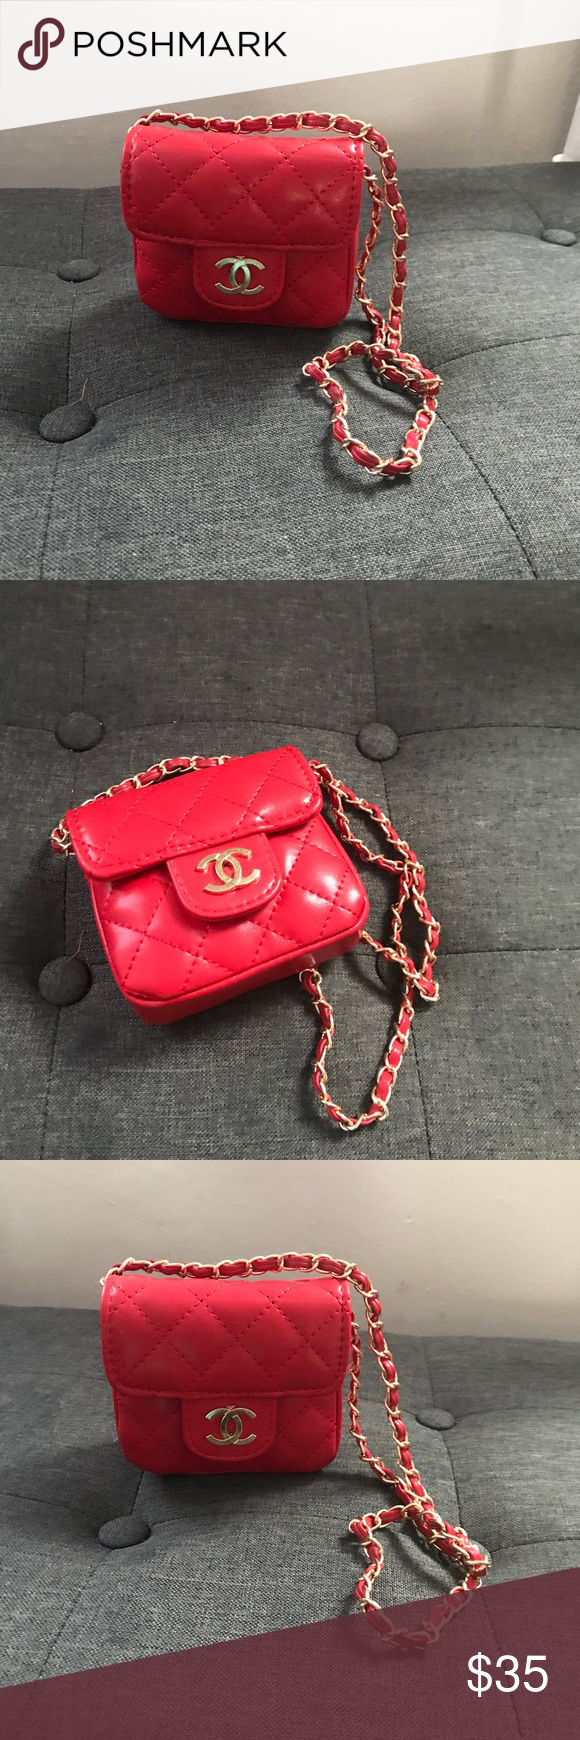 6dbf9071d4ed Mini Children bag Mini Chanel inspired bags for kids Accessories Bags